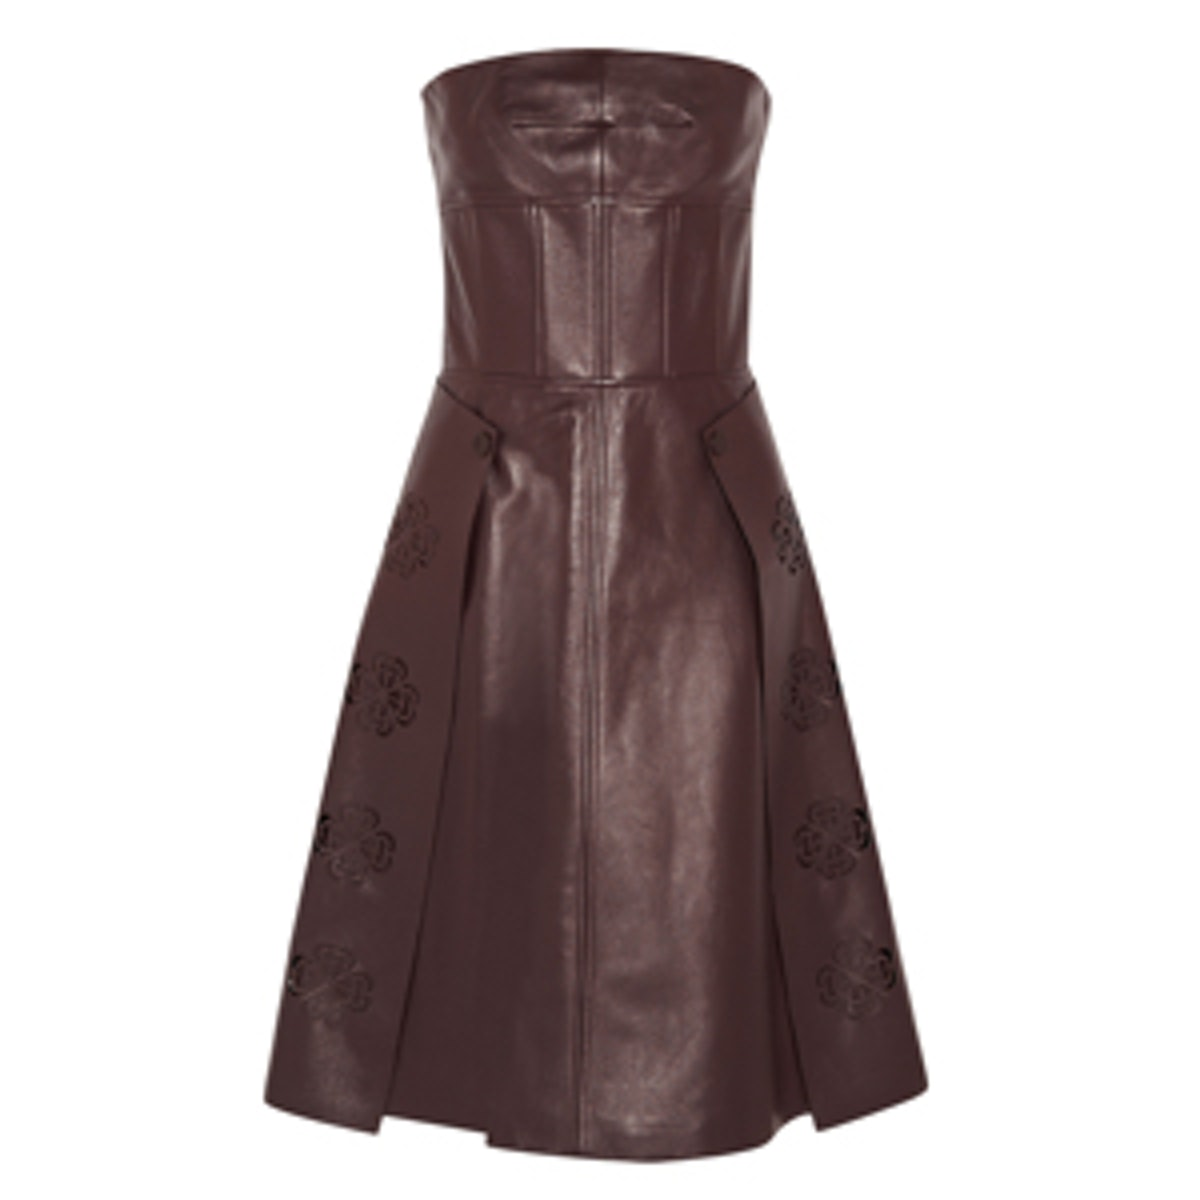 Laser-cut Leather Dress